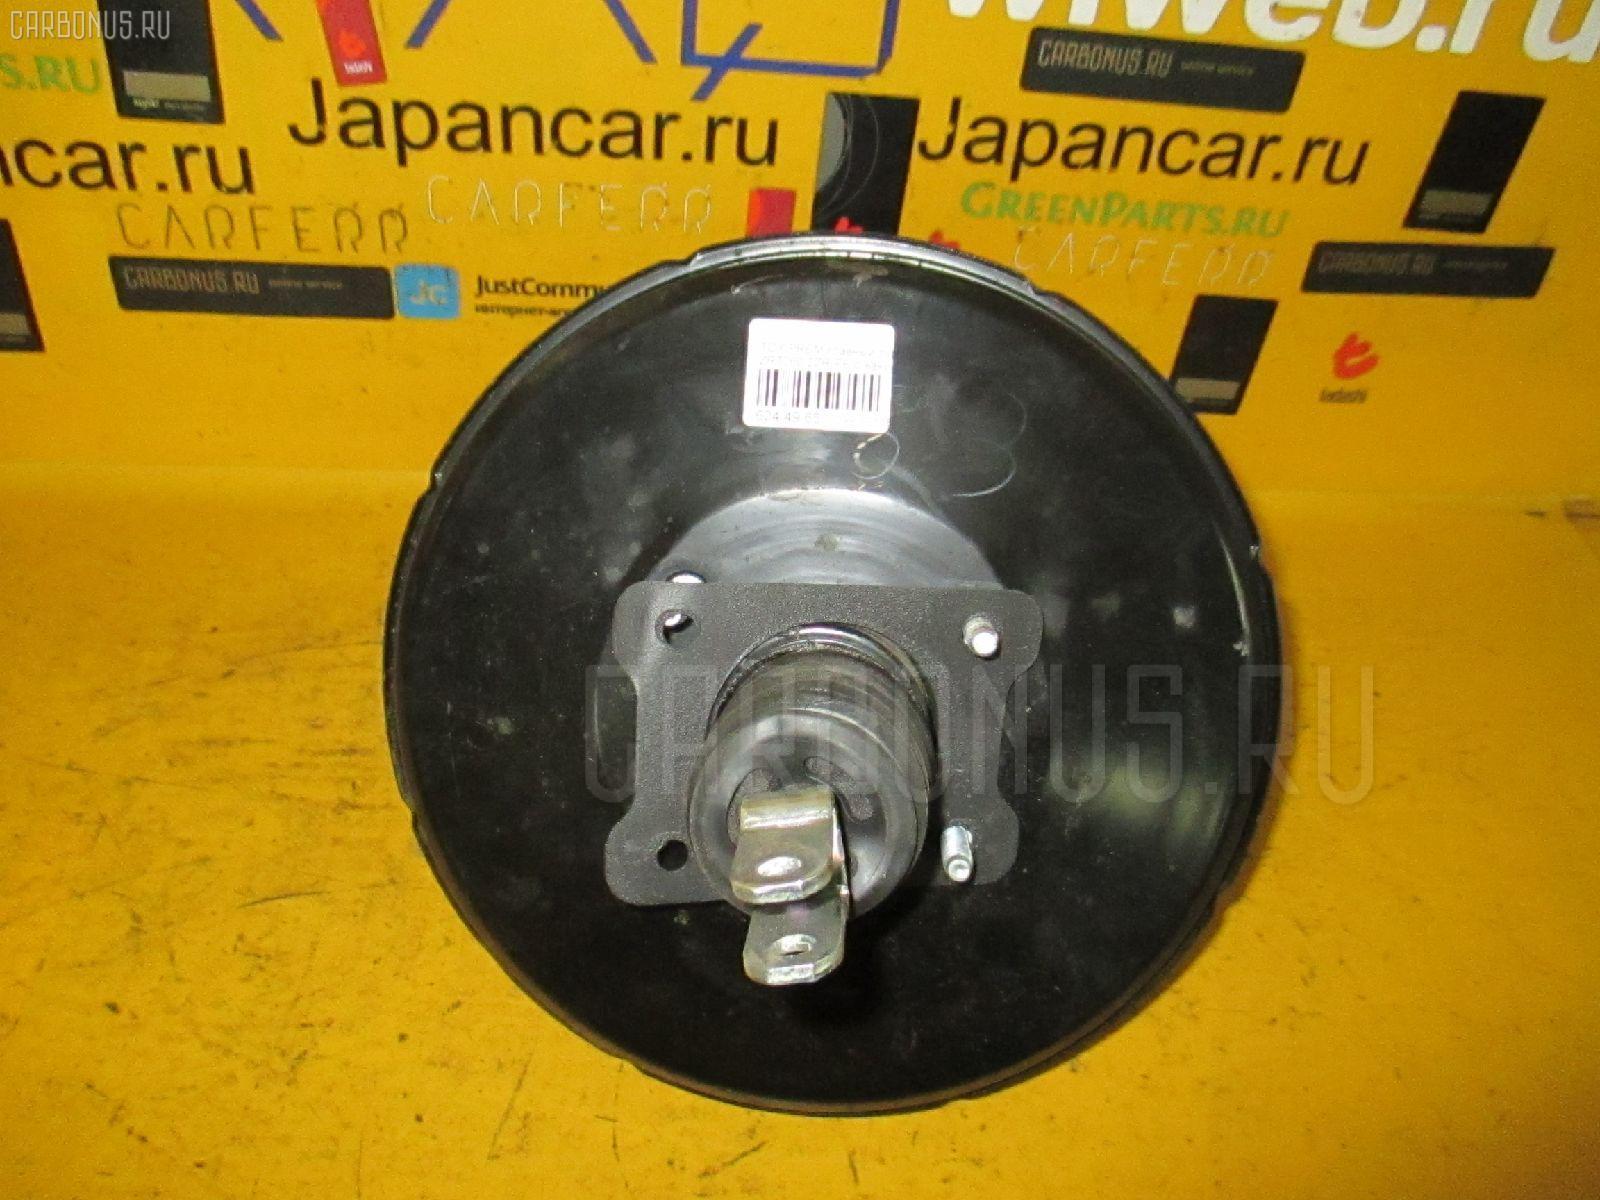 Главный тормозной цилиндр Toyota Premio ZRT260 2ZR-FE Фото 1